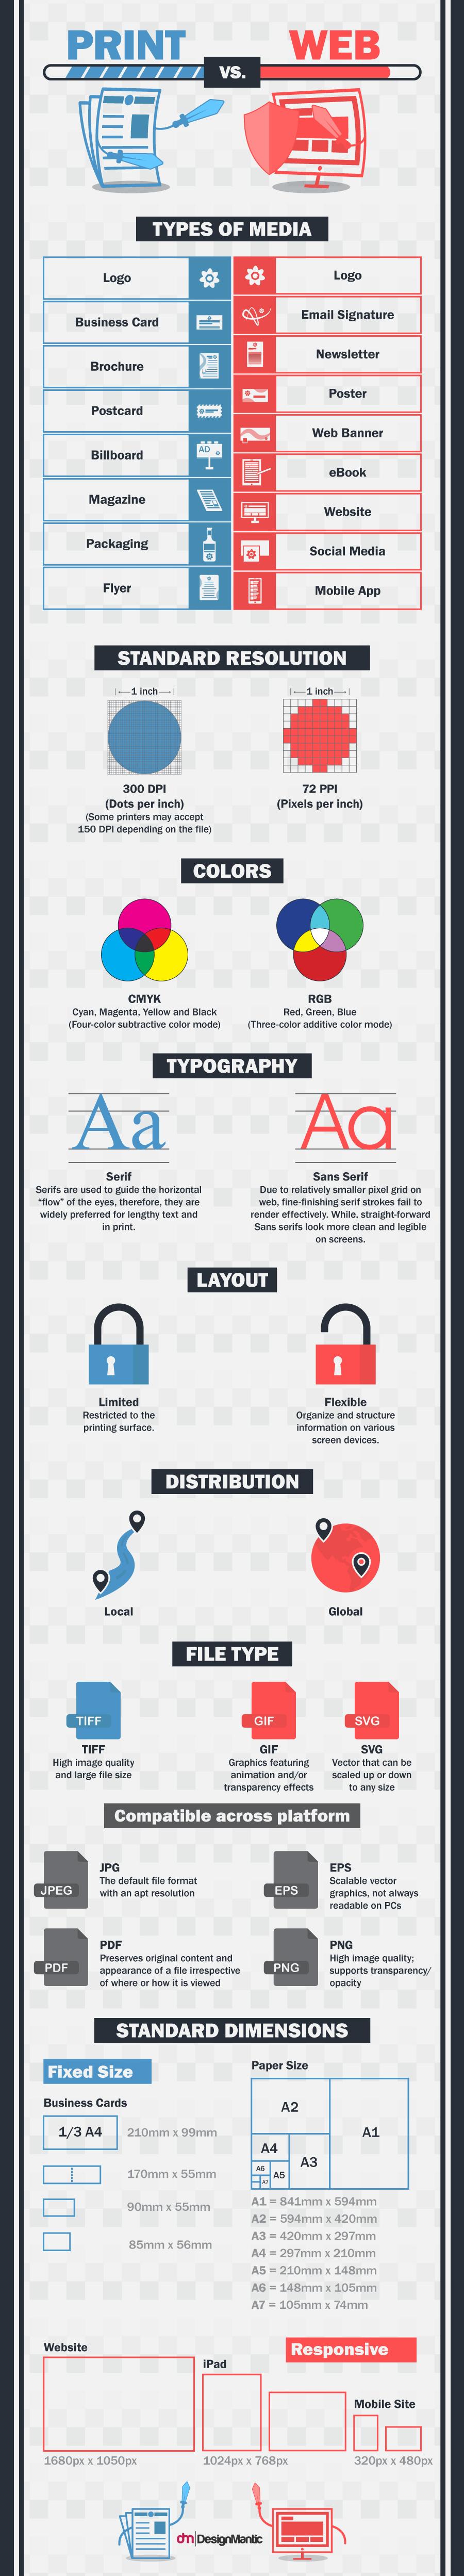 Print vs Web Design